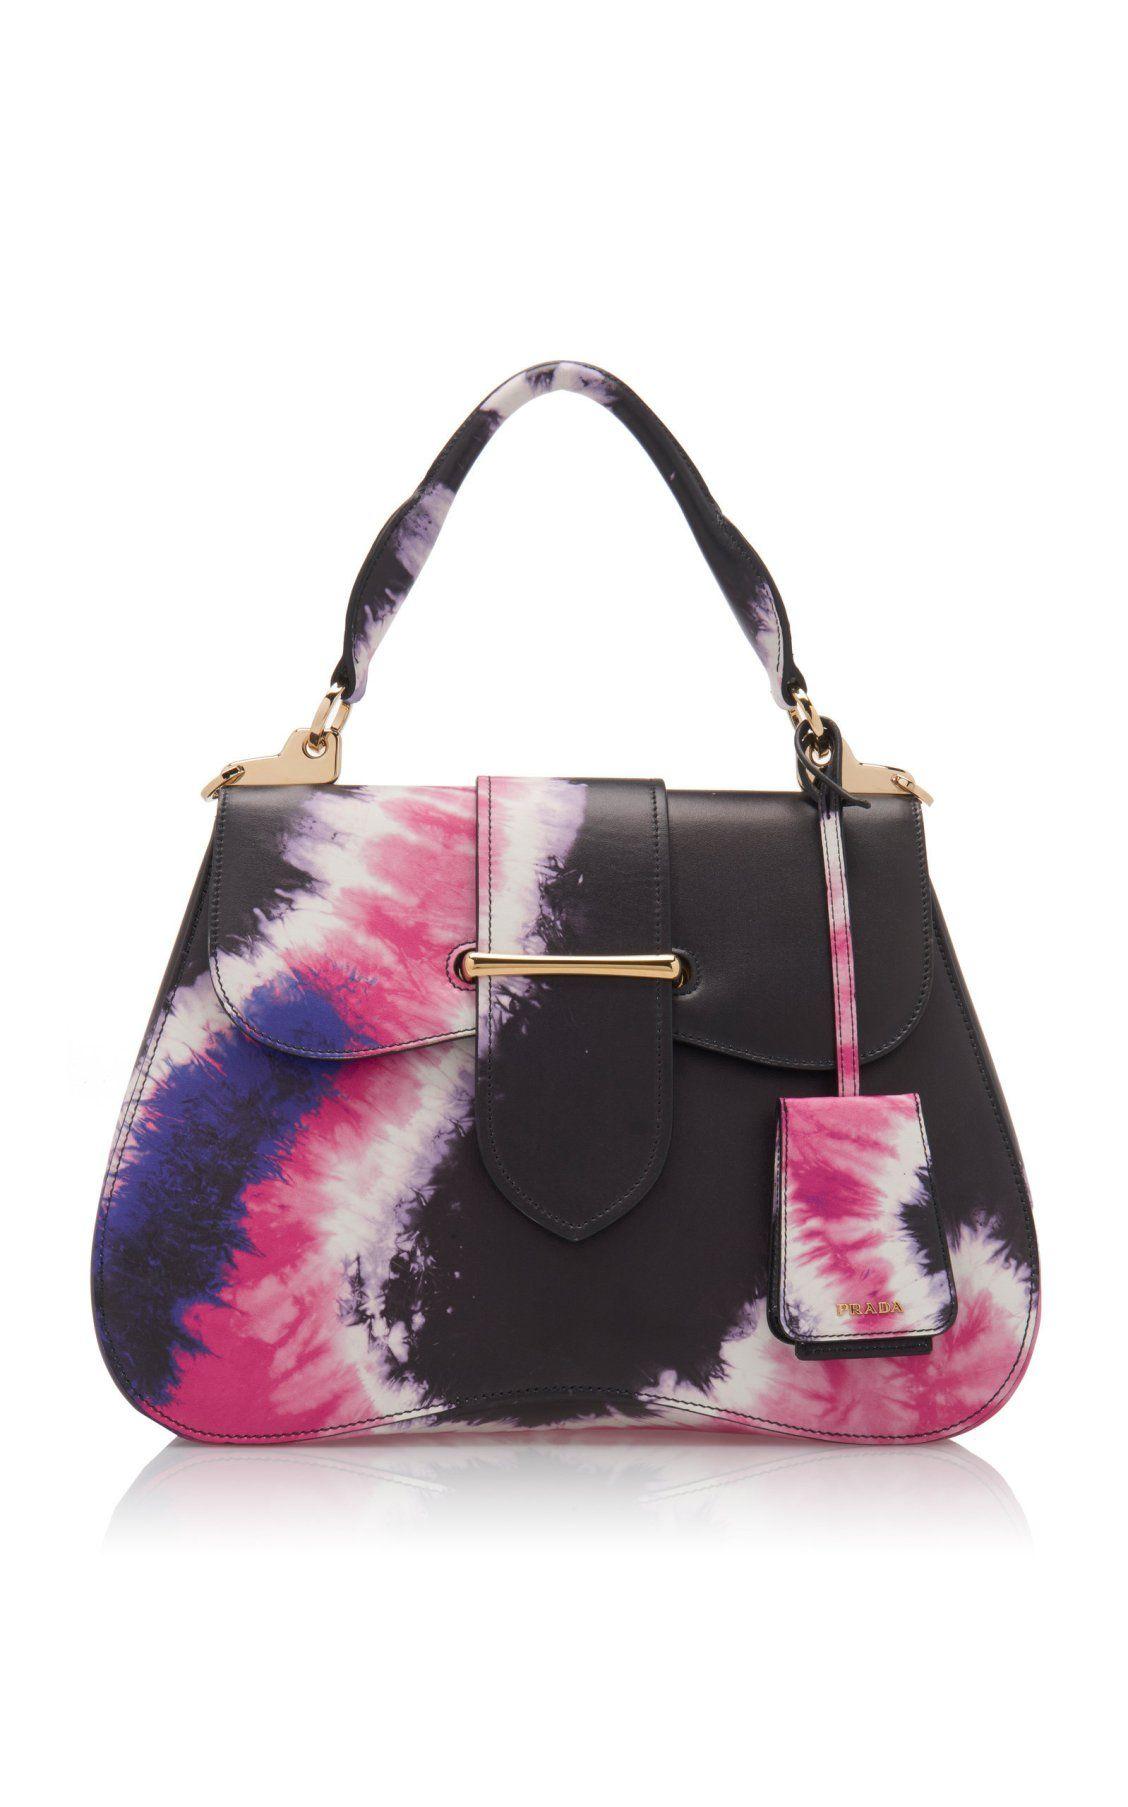 d690c55e2aa3 Large Tie-Dye City Calf Cartella Bag by Prada Spring/Summer 2019| Moda  Operandi